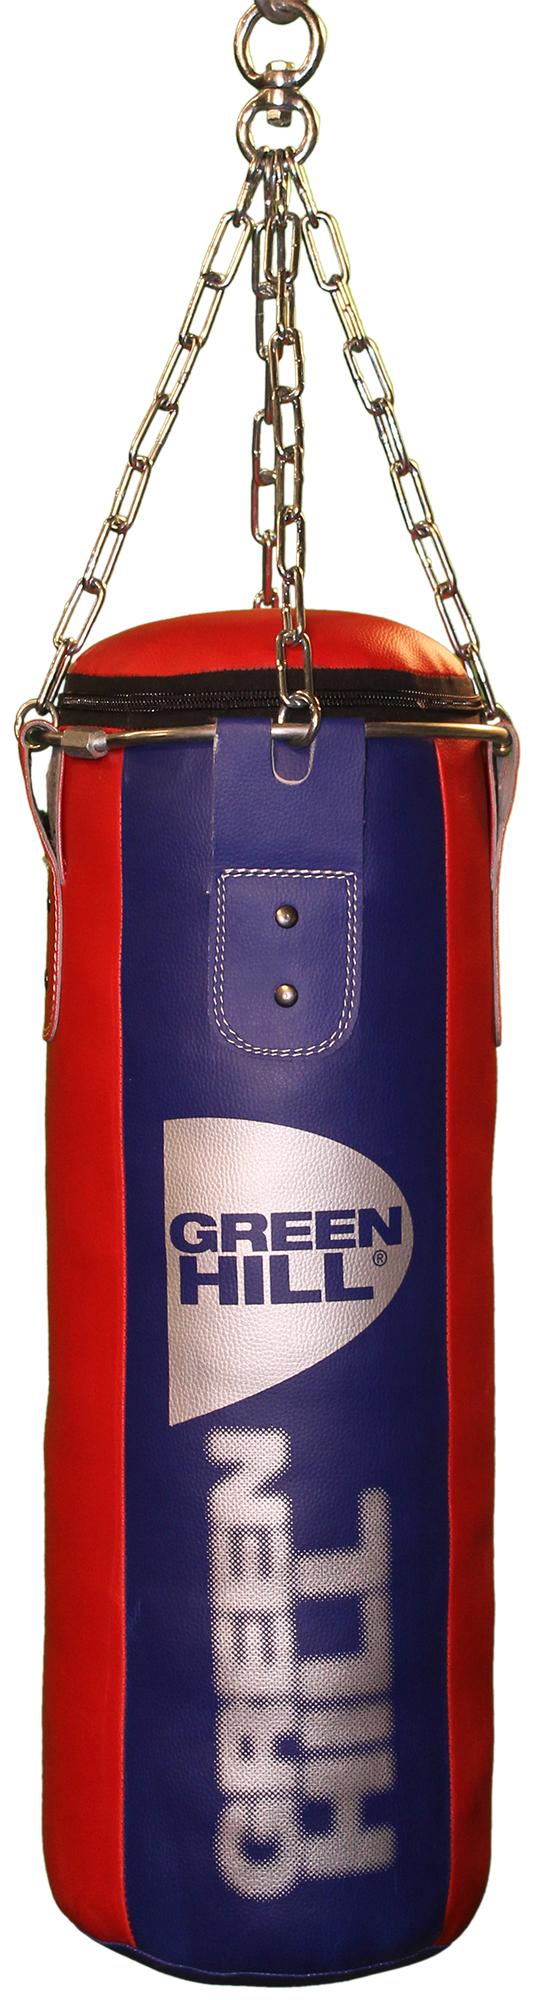 Green Hill Мешок набивной Green Hill, 20 кг cпальный мешок helios батыр сок 2 green 0612